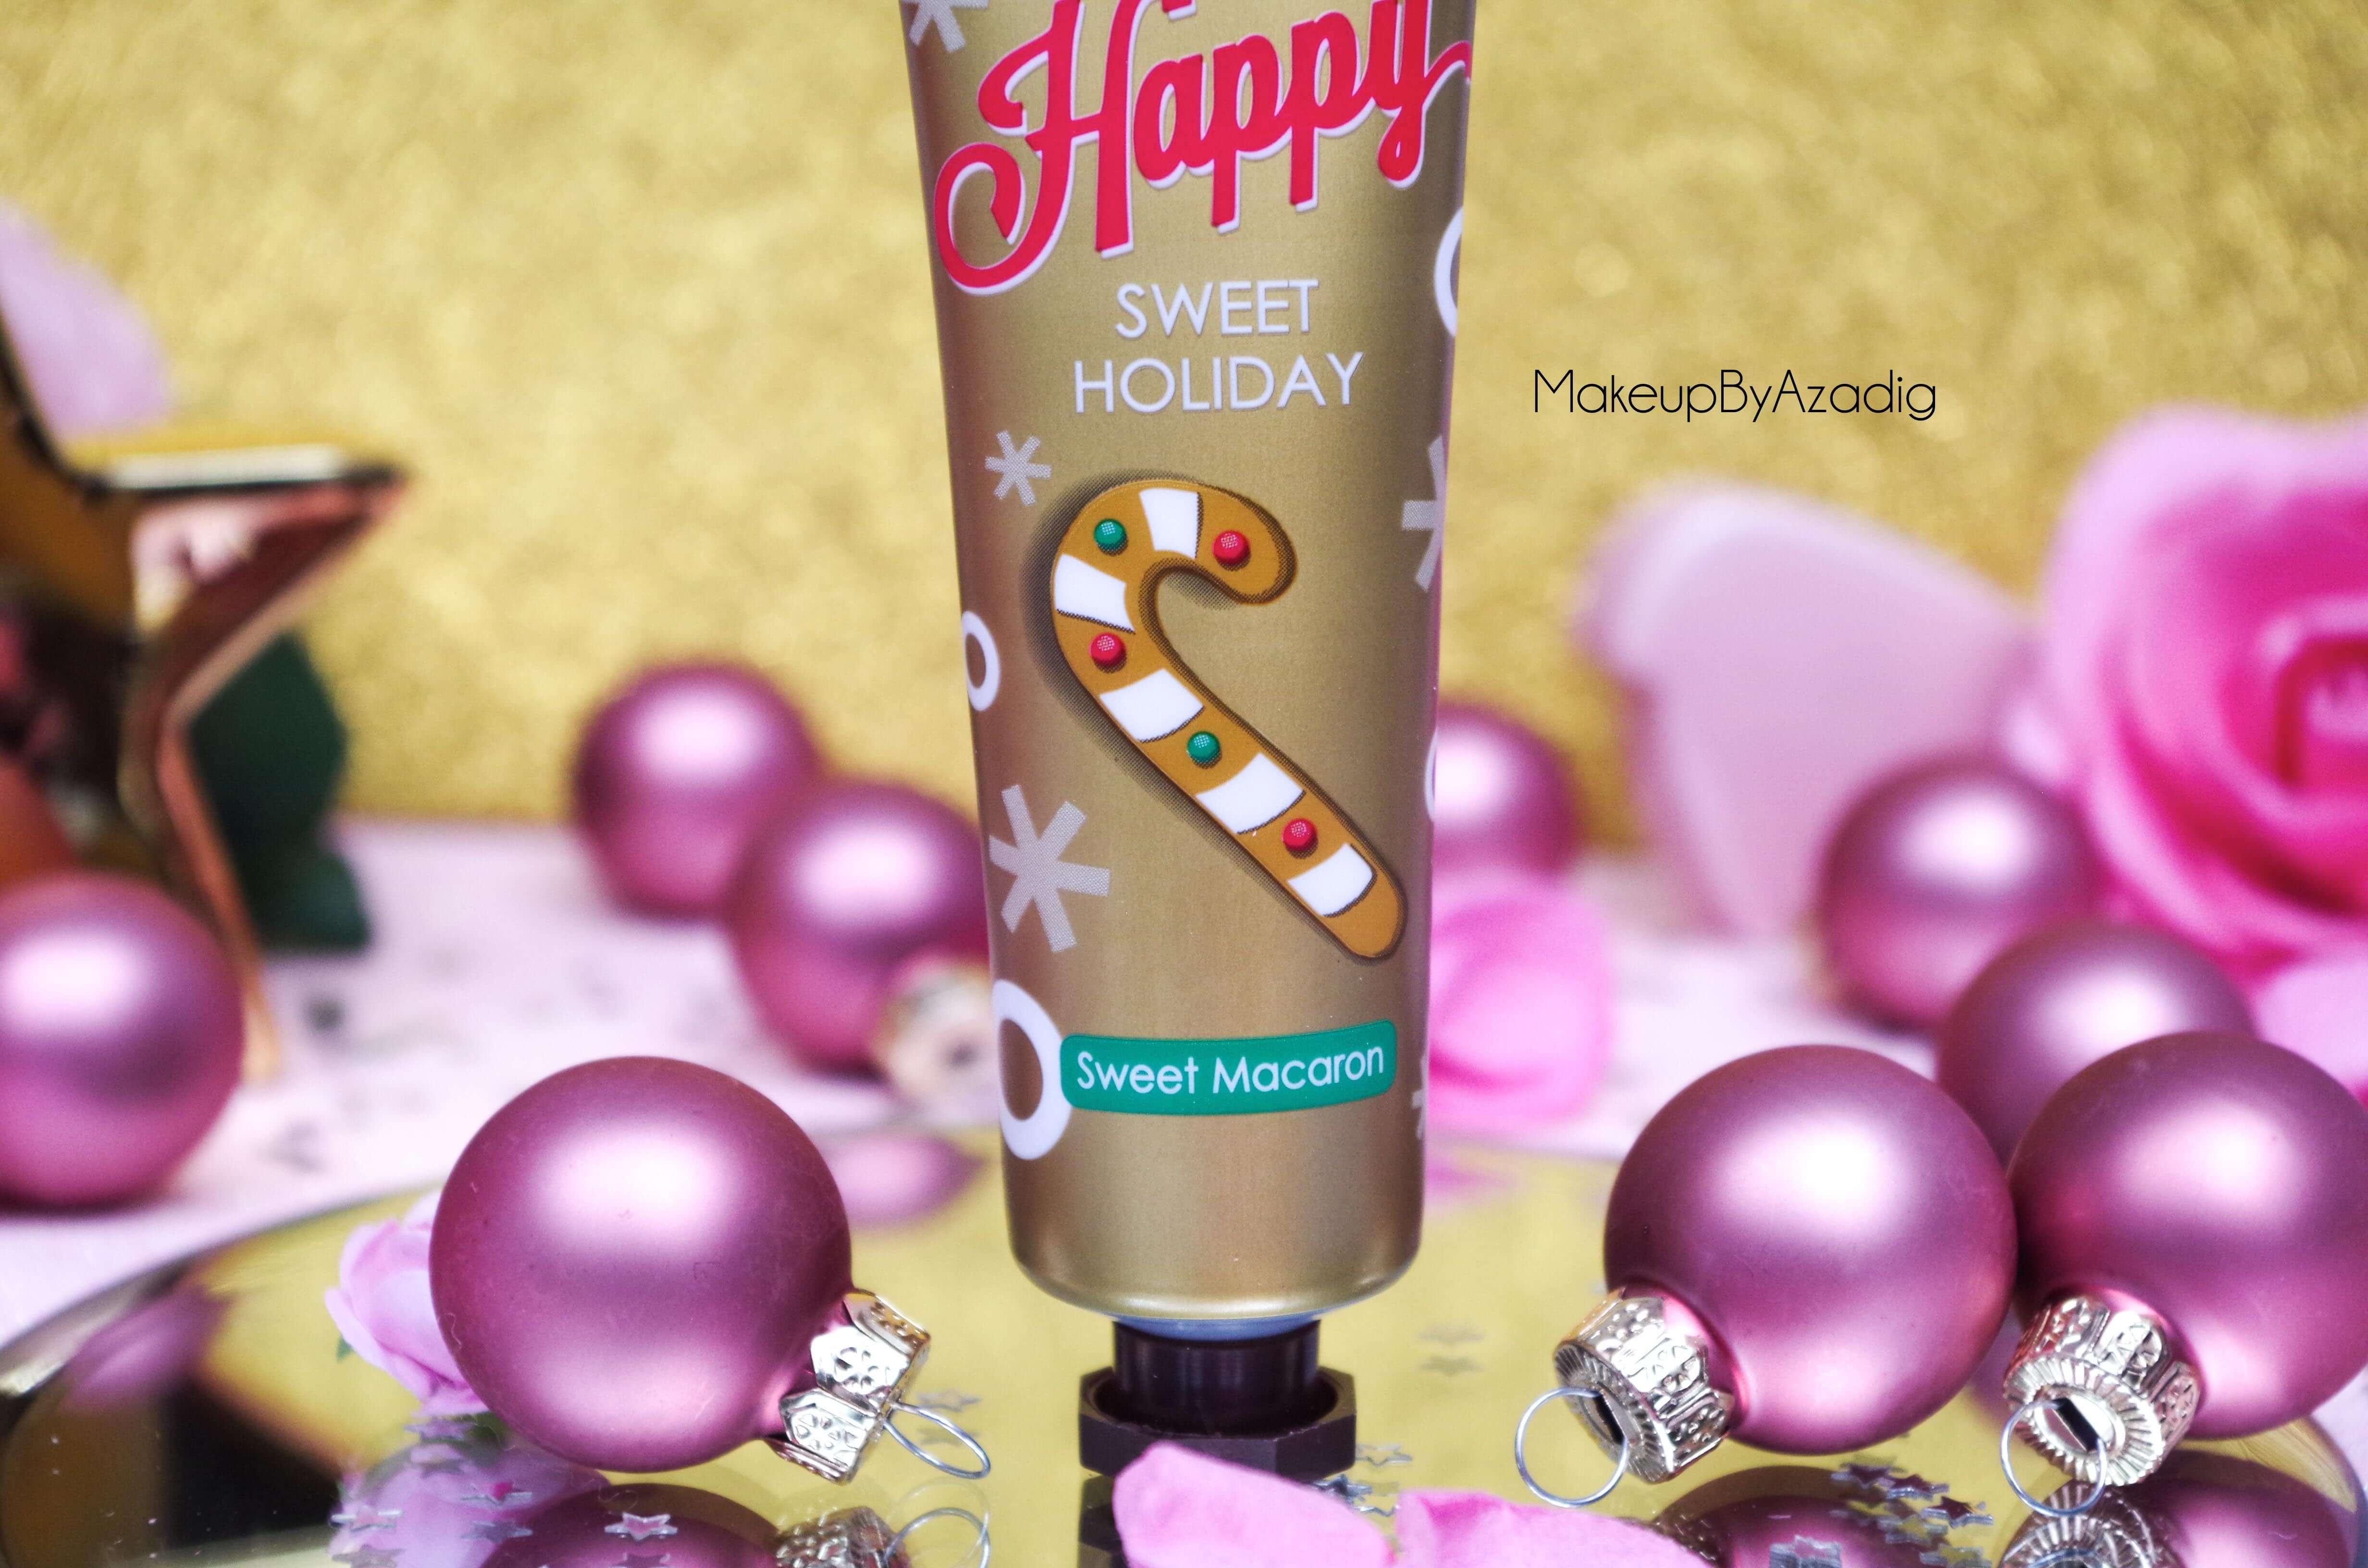 makeupbyazadig-tonymoly-sephora-paris-troyes-creme-mains-collection-noel-holiday-avis-revue-macaron